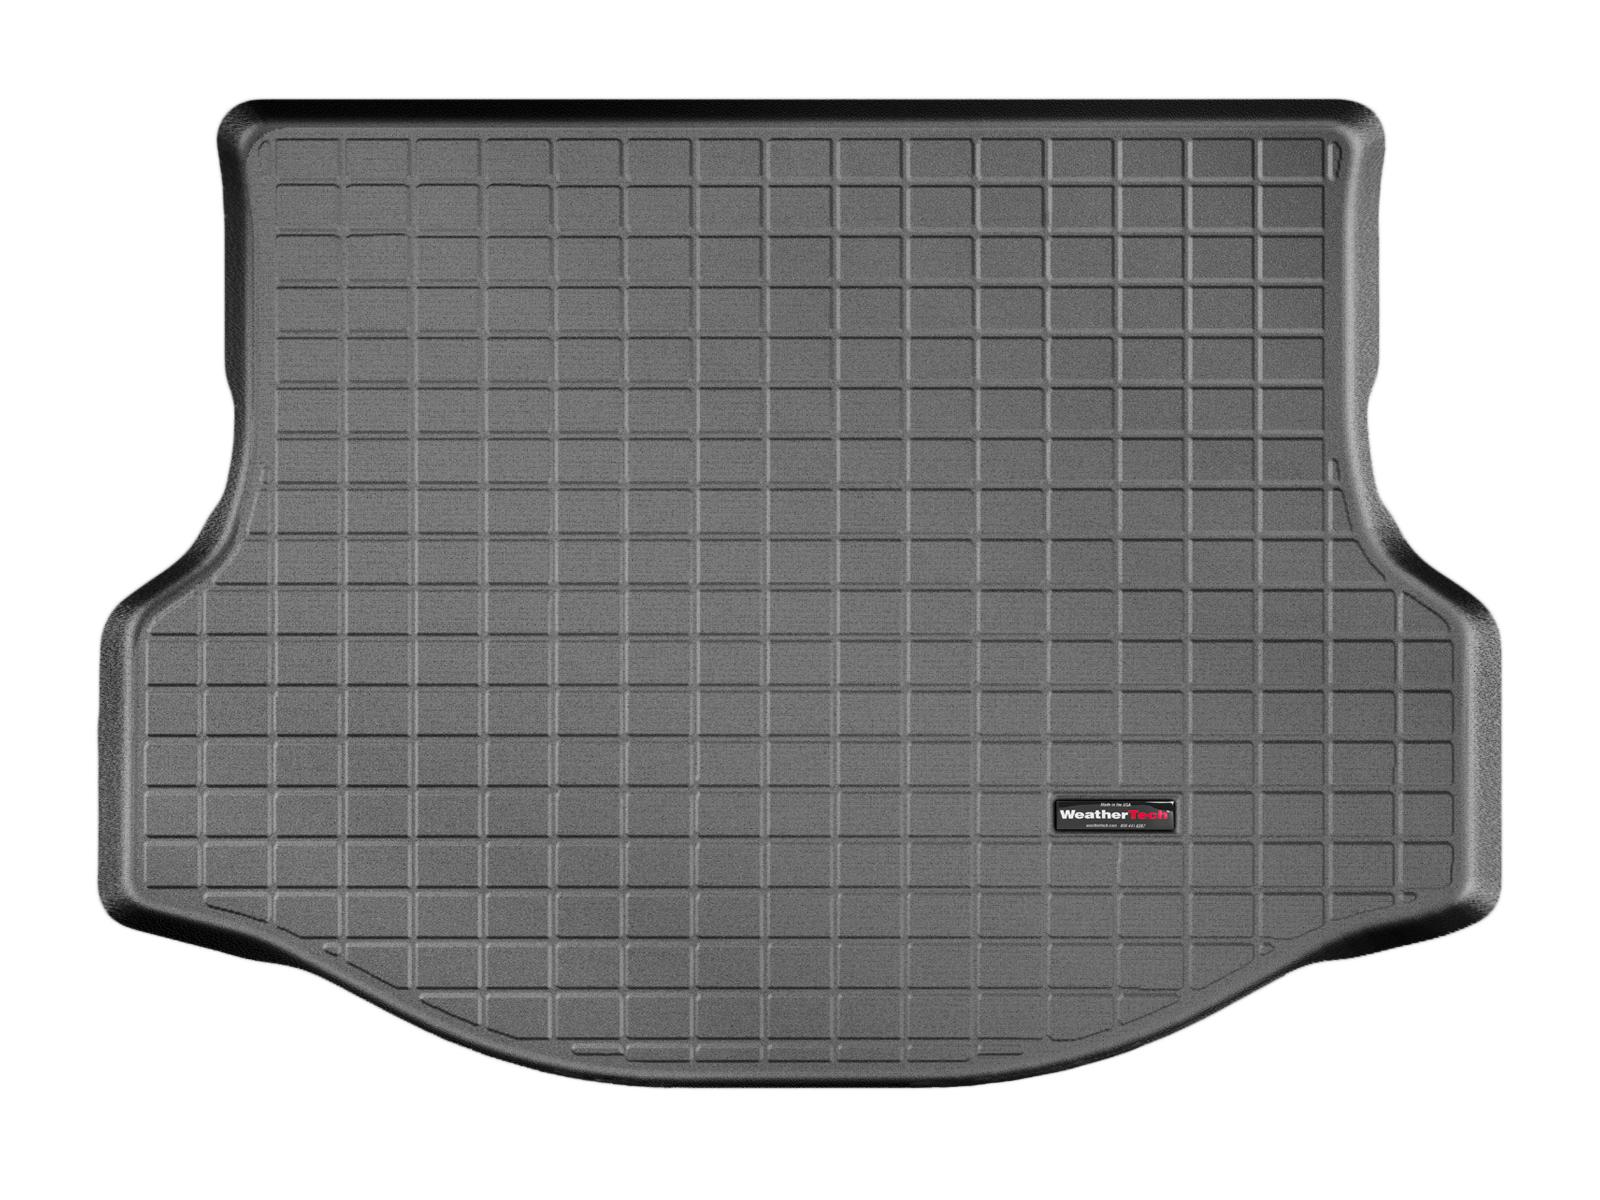 Toyota RAV4 2013>2013 Vasca baule WeatherTech bagagliaio nero *1292*